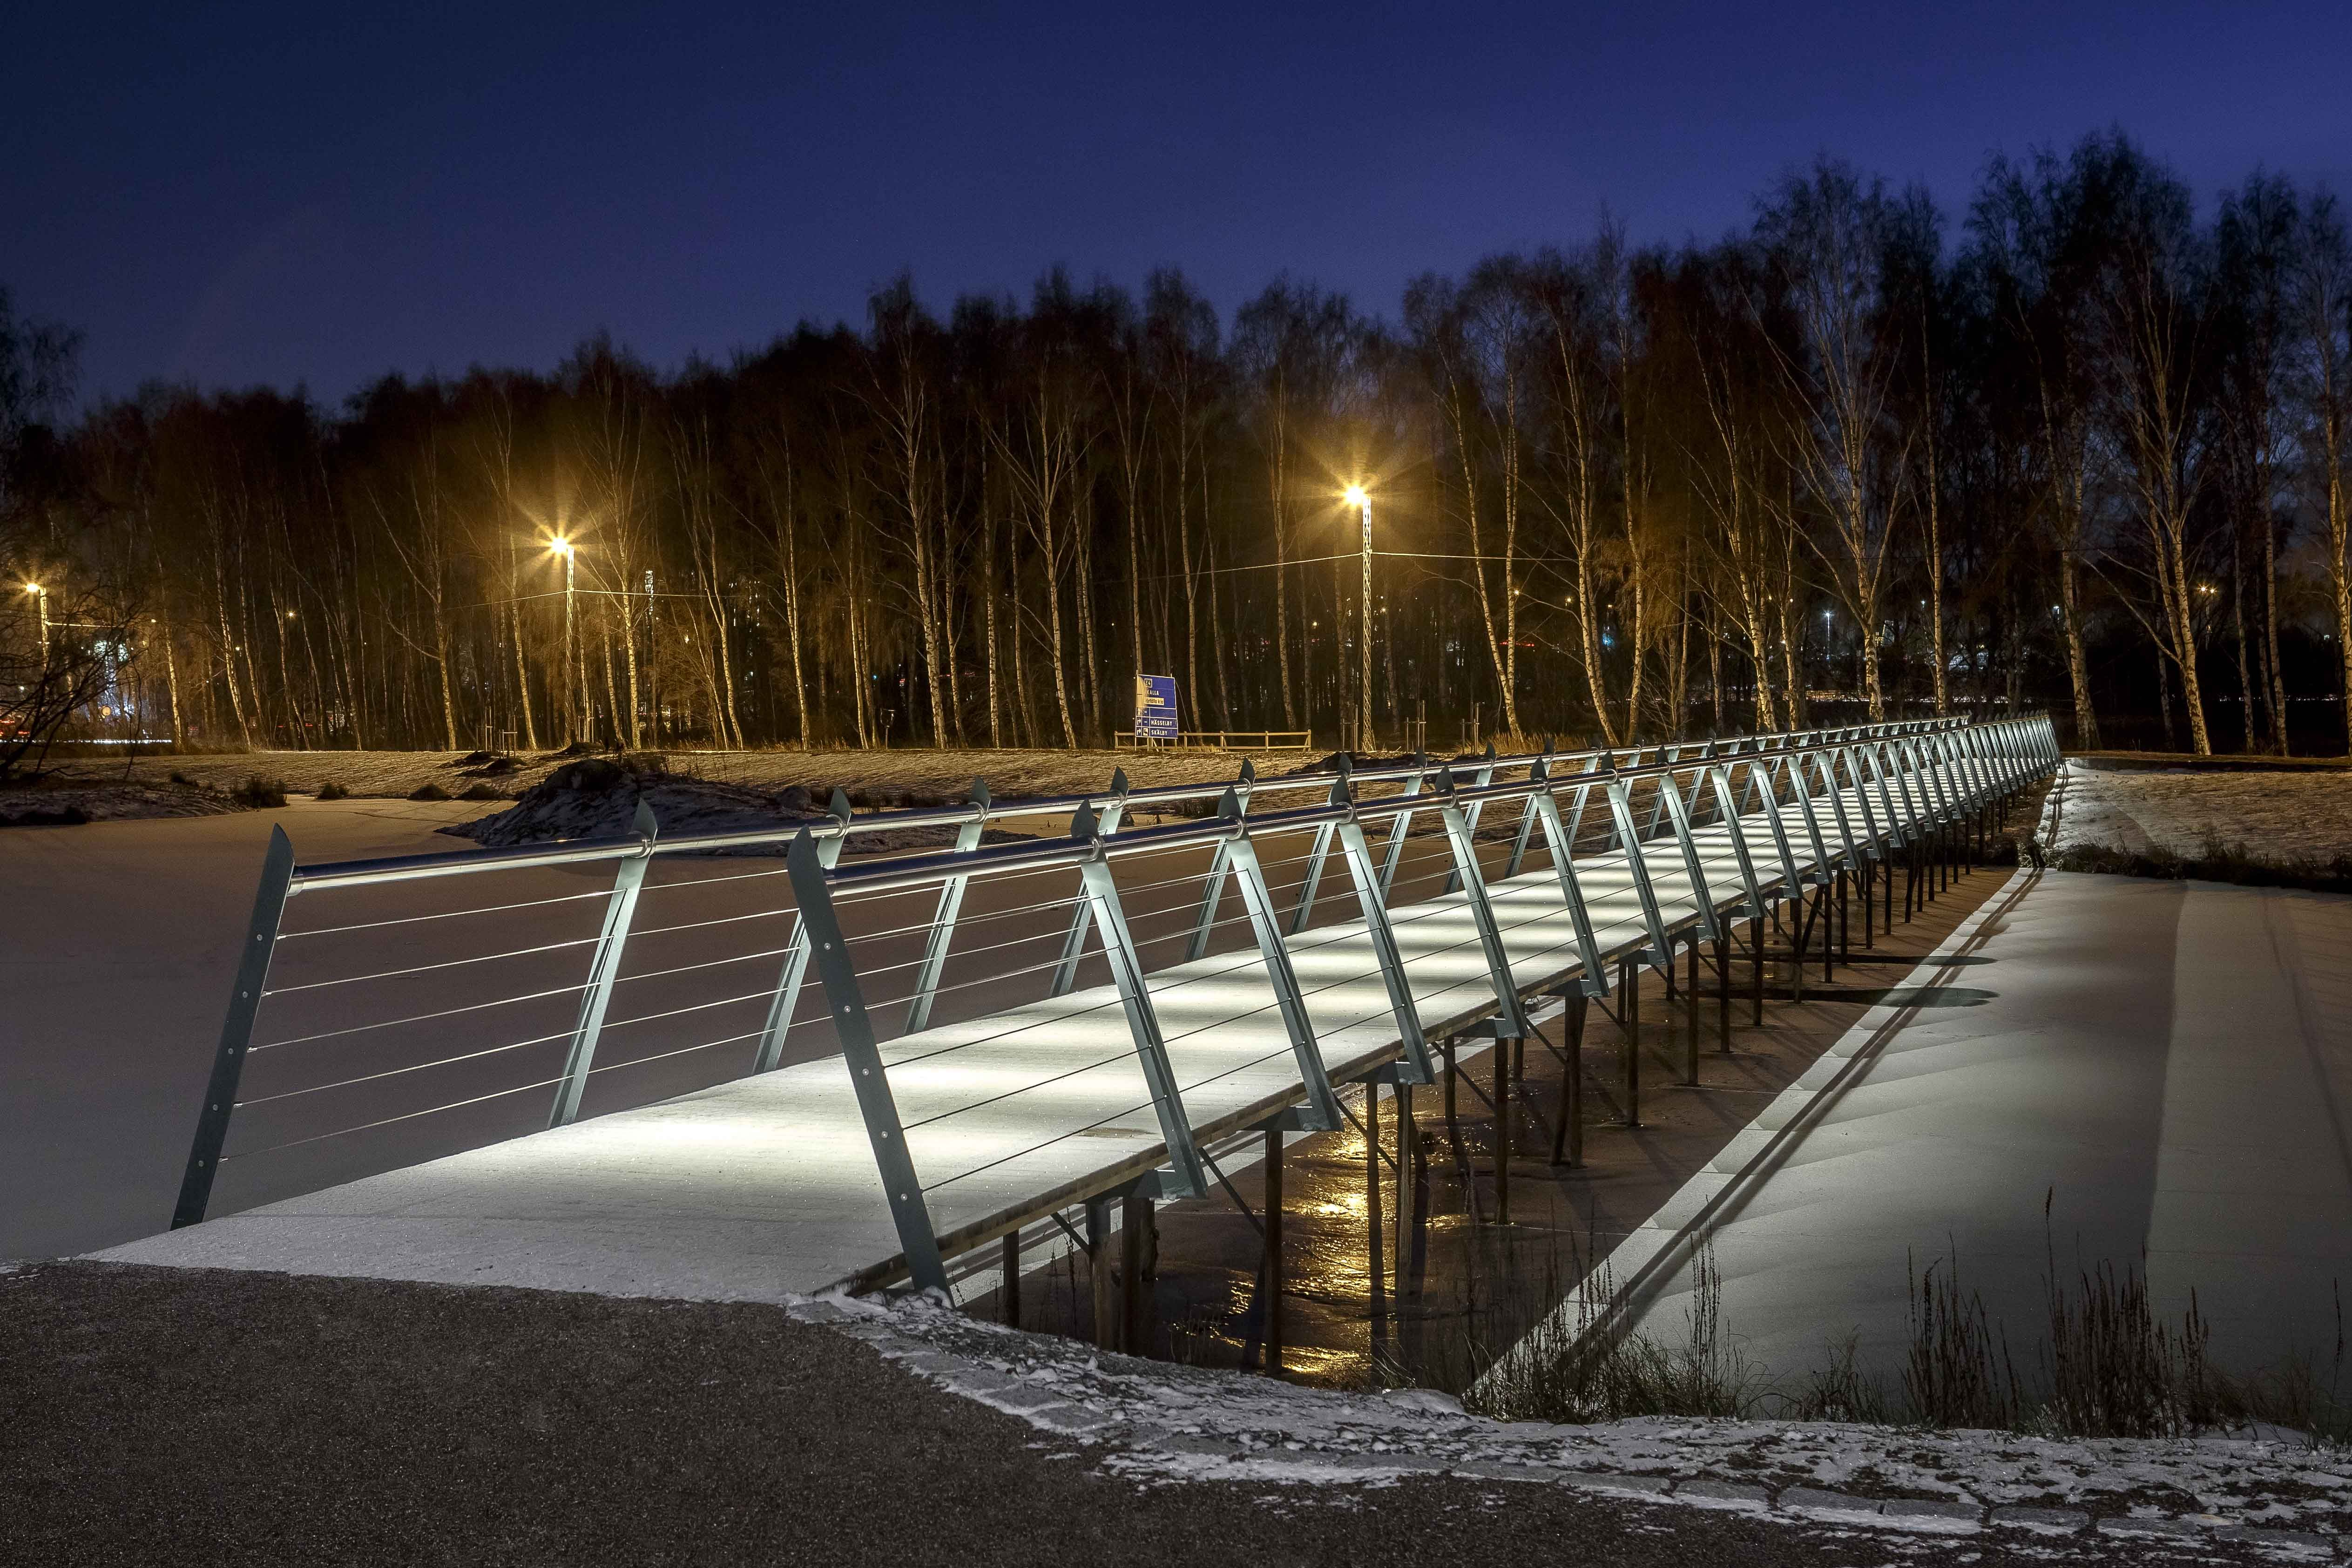 /Kyrkparken- Lighting design by Black Ljusdesign/ Lighting Design - Architecture - Lighting - Public spaces - Outdoor - Park - Bridge - Handrail light - Bridge Lighting